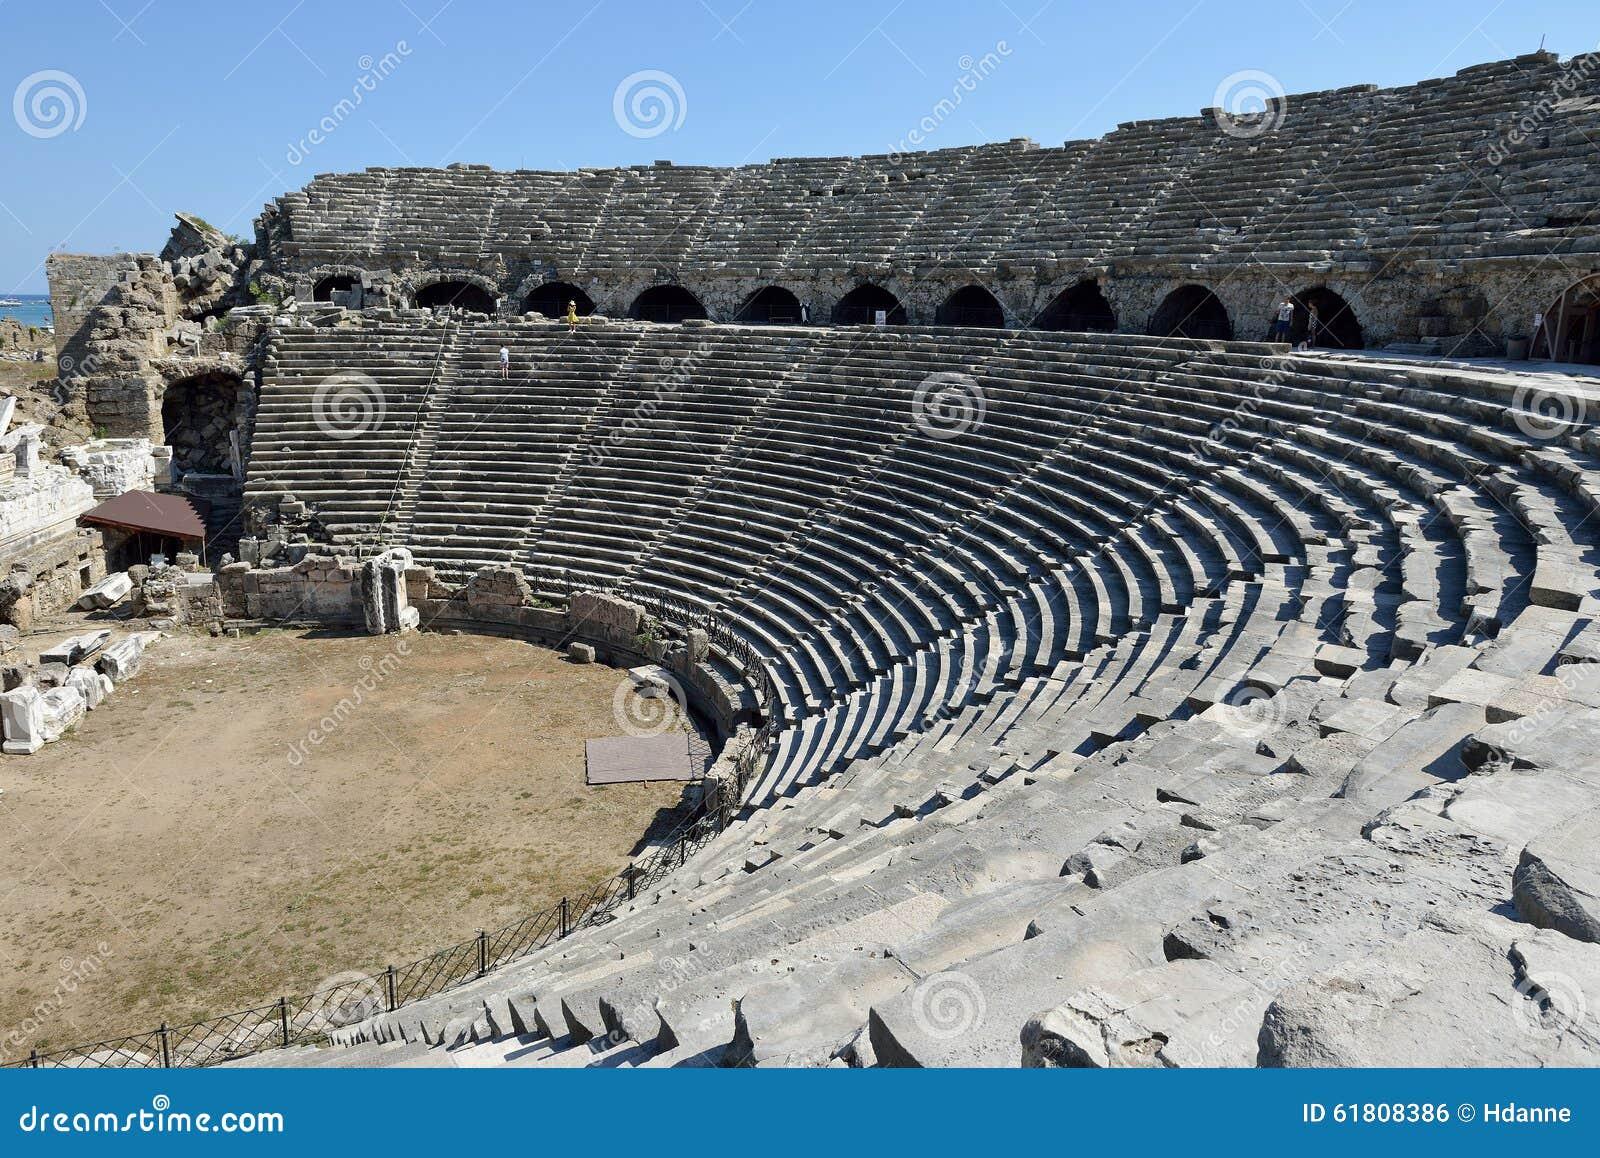 Greek Amphitheater, Side Editorial Photo - Image: 61808386